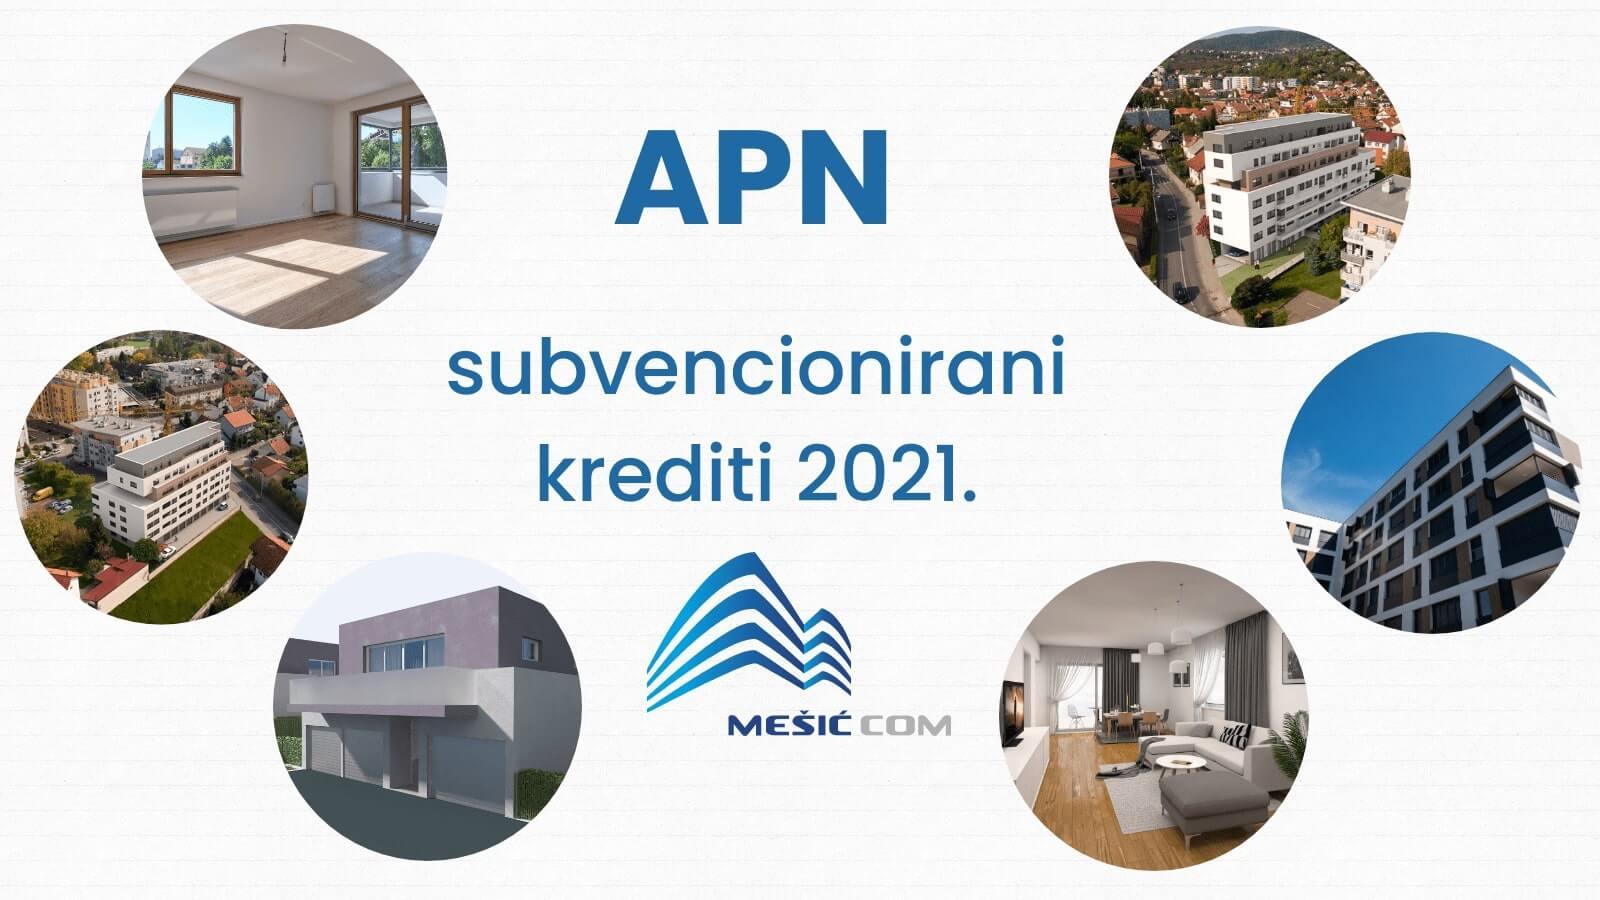 Subvencionirani Krediti 2021 Mesić